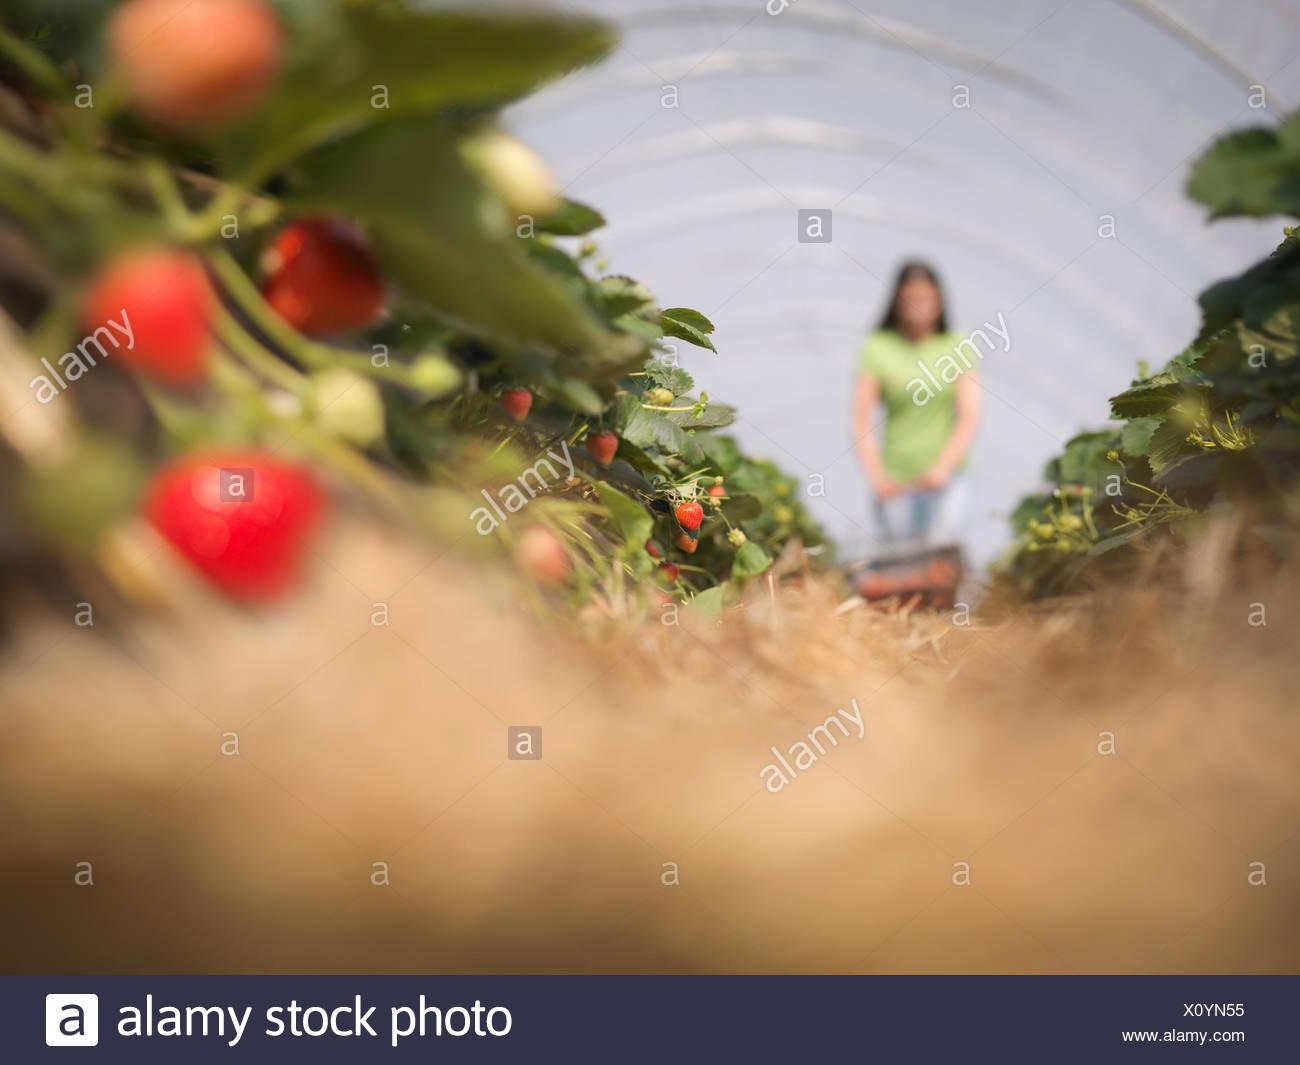 Worker picking strawberries on fruit farm - Stock Image